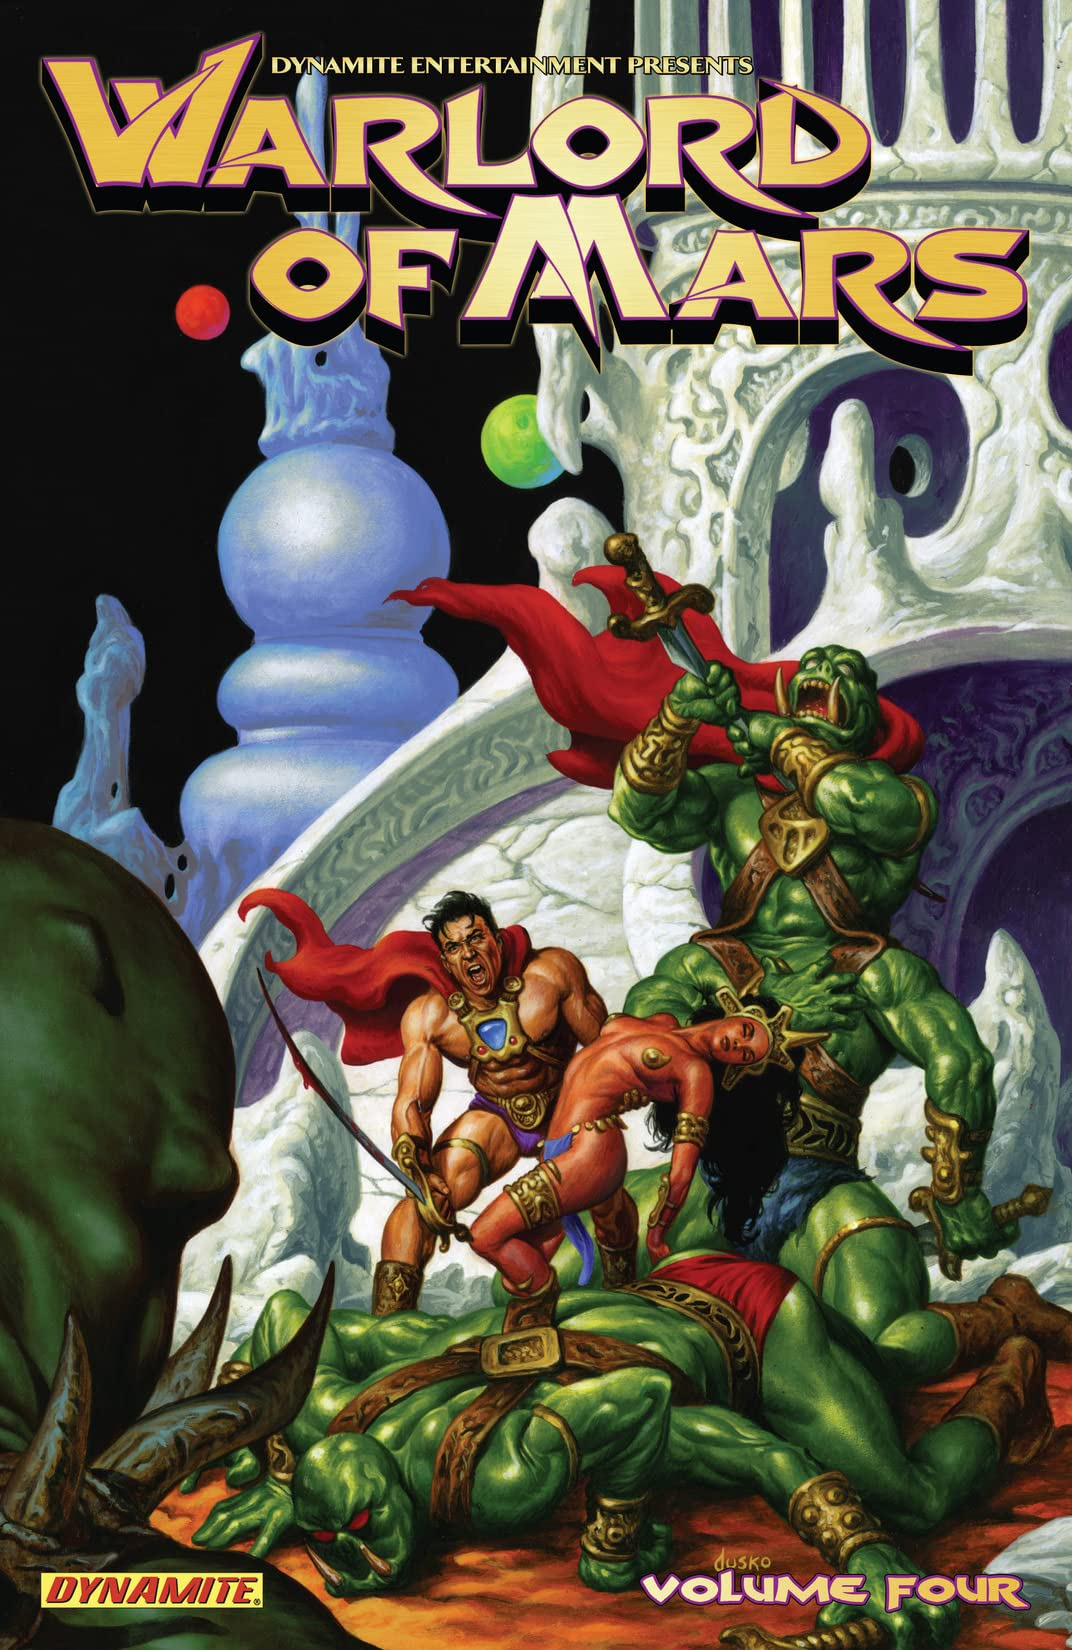 Warlord of Mars Vol. 4